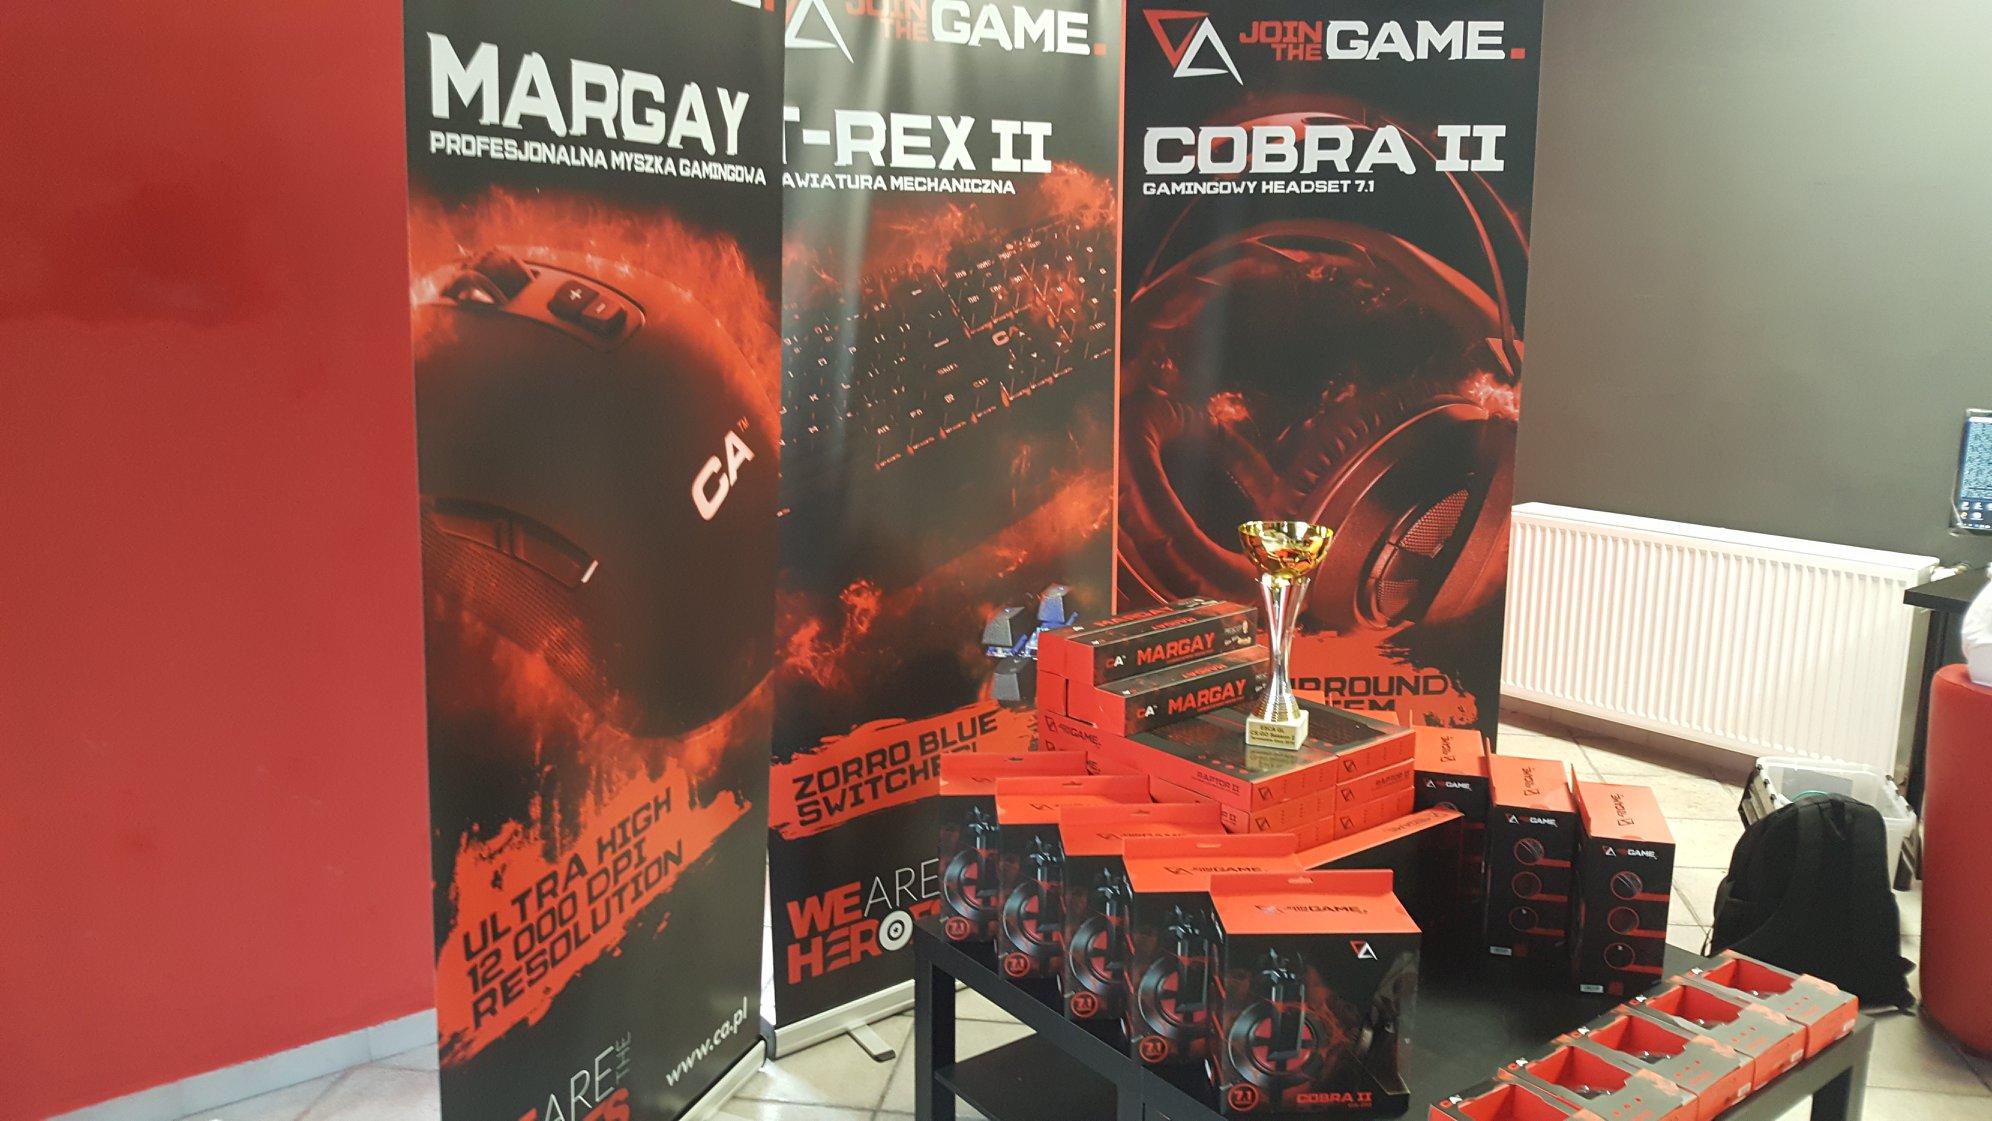 ESCA GL CS:GO 2018 Season 2 - Final Tournament